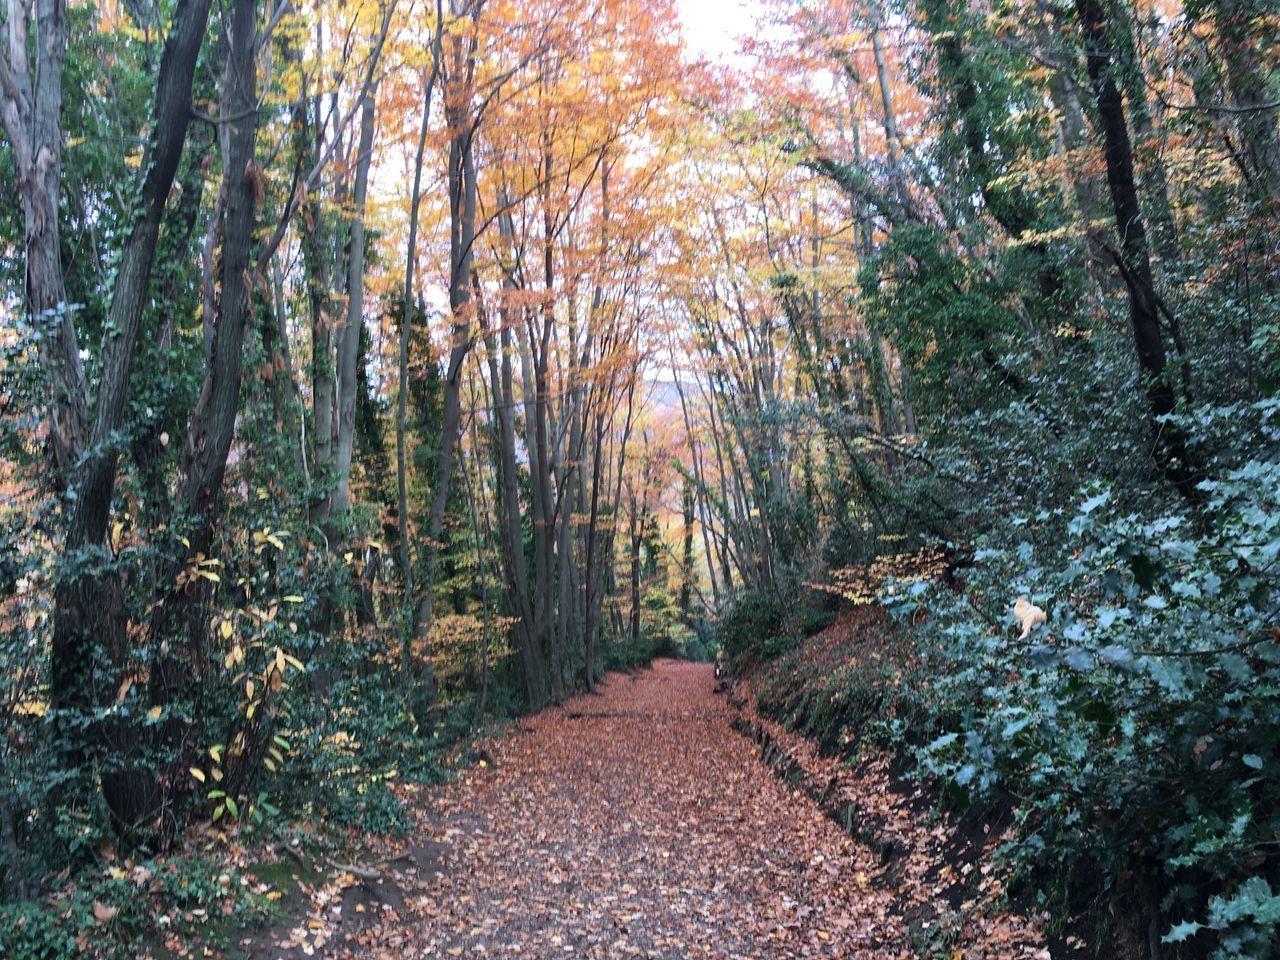 La Fageda Autumn Garrotxa Fageda D'en Jorda Fageda Catalunyaexperience Catalunya